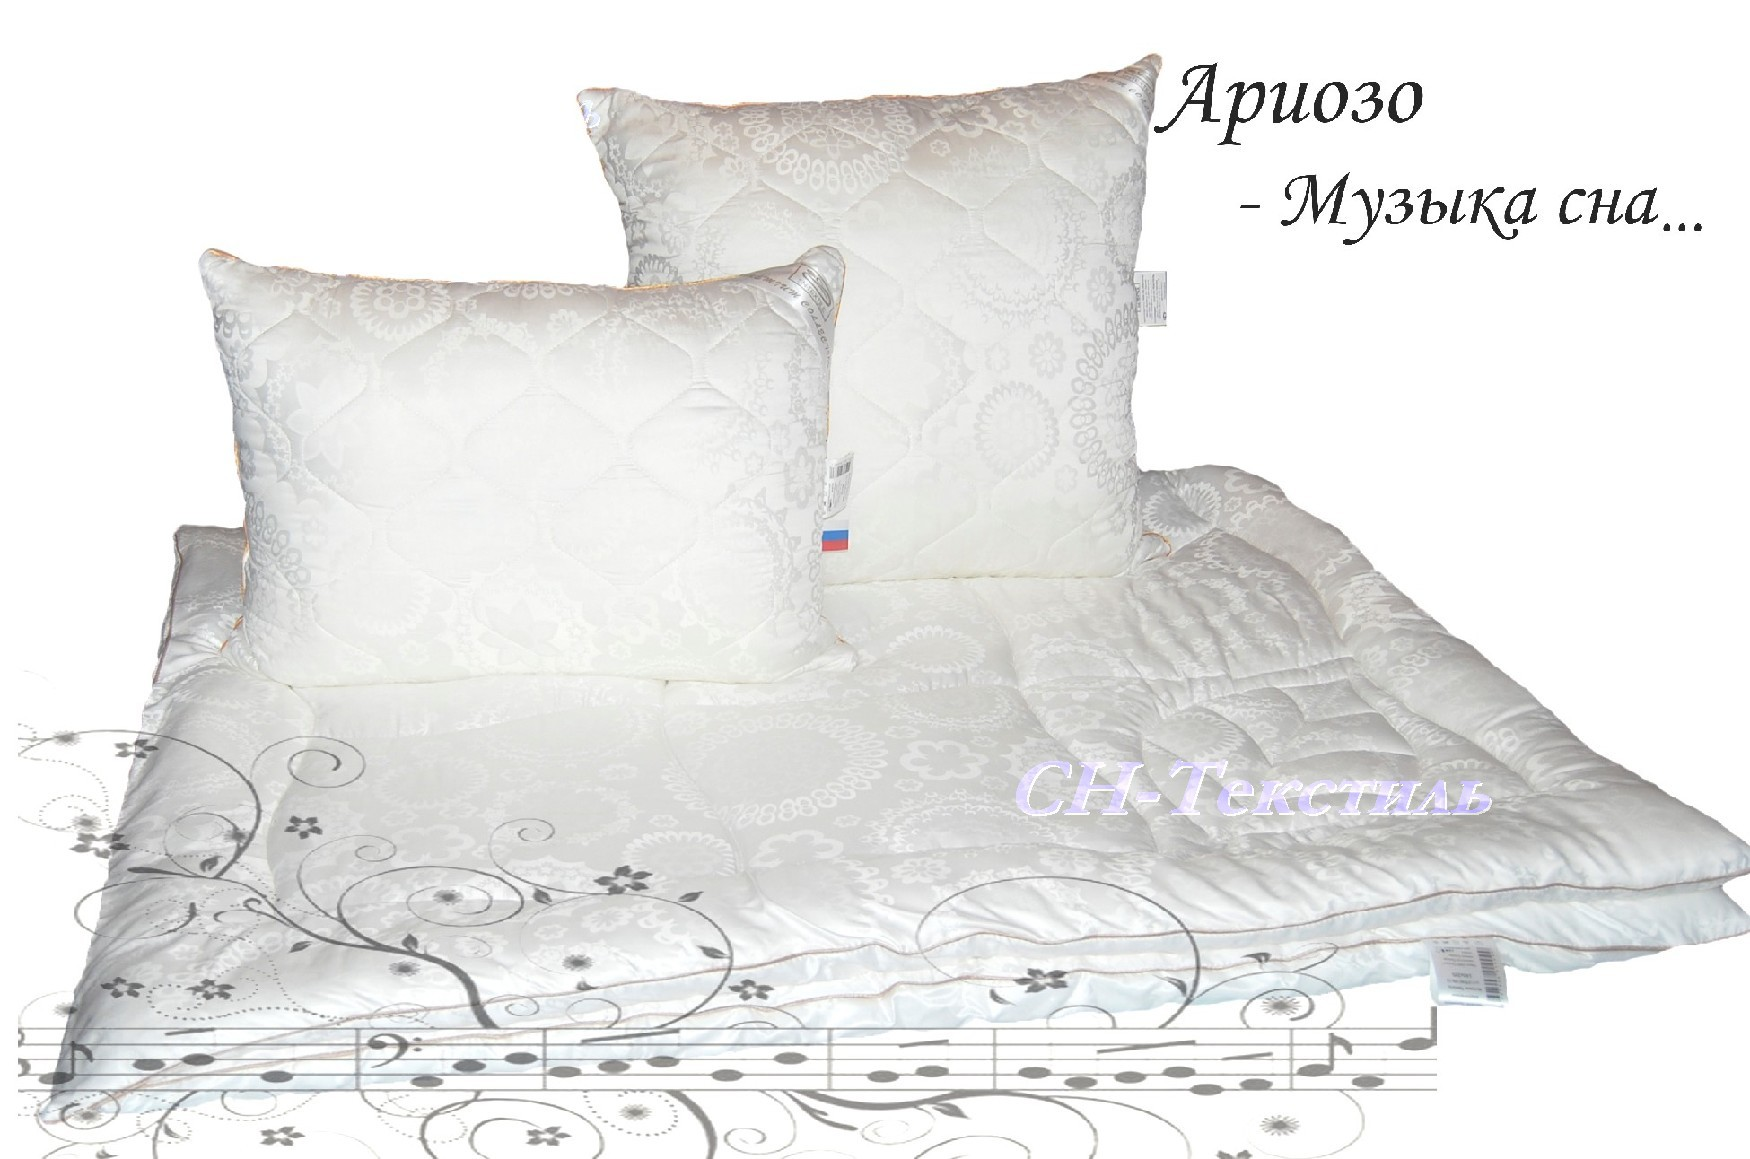 Тенсель (эвкалипт) / МОДАЛ (бук) Одеяло Коллекции Ариозо всесезонное TENCEL Премиум. Ариозо1.jpg